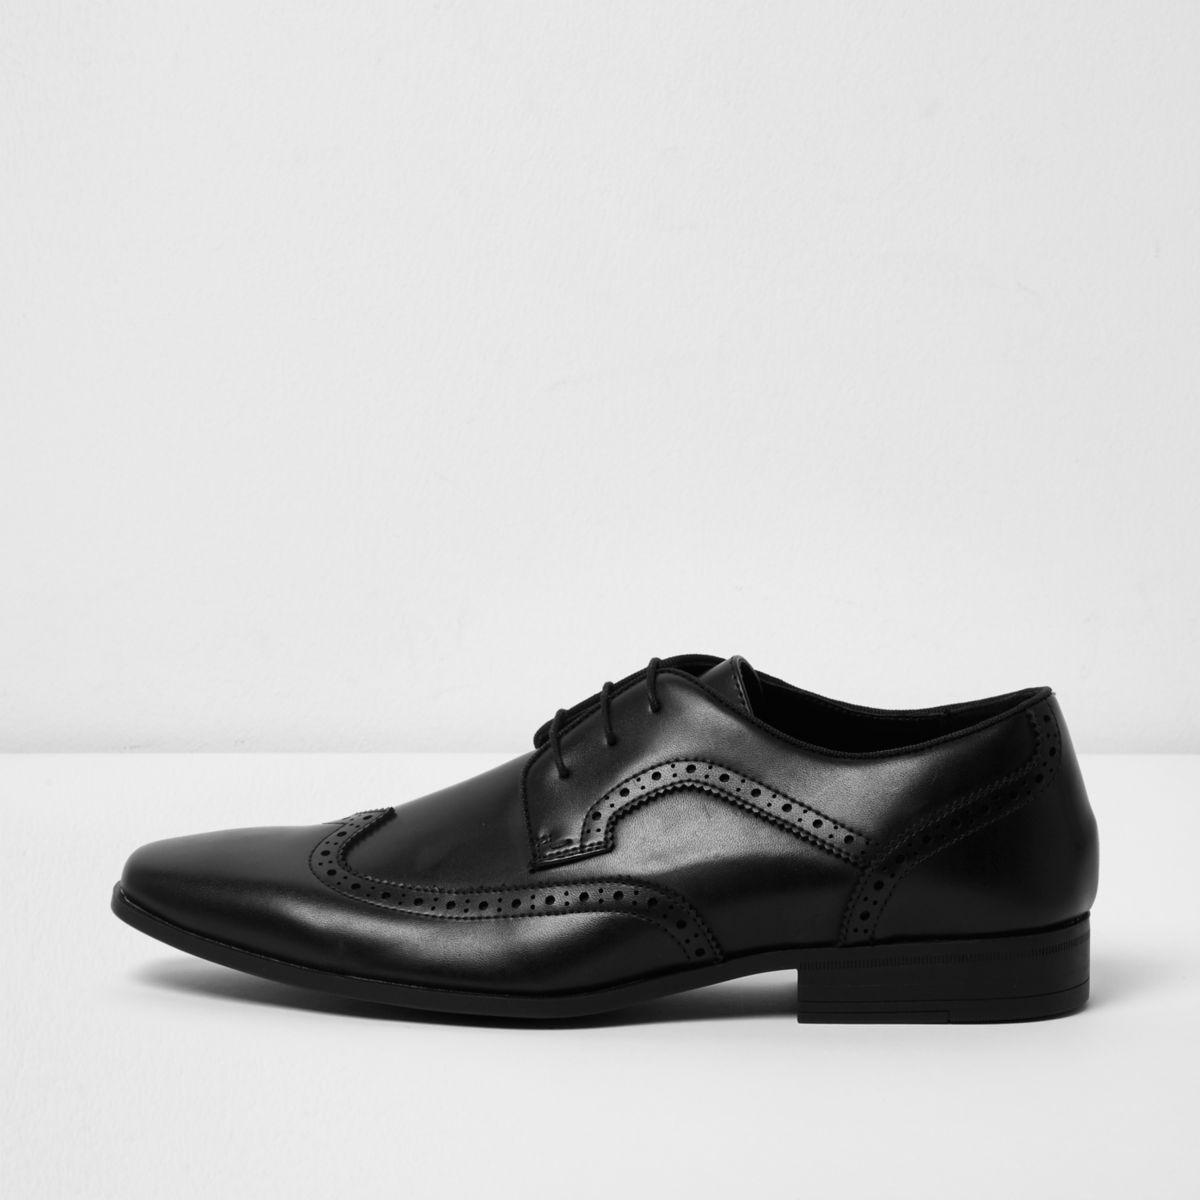 Black formal brogues